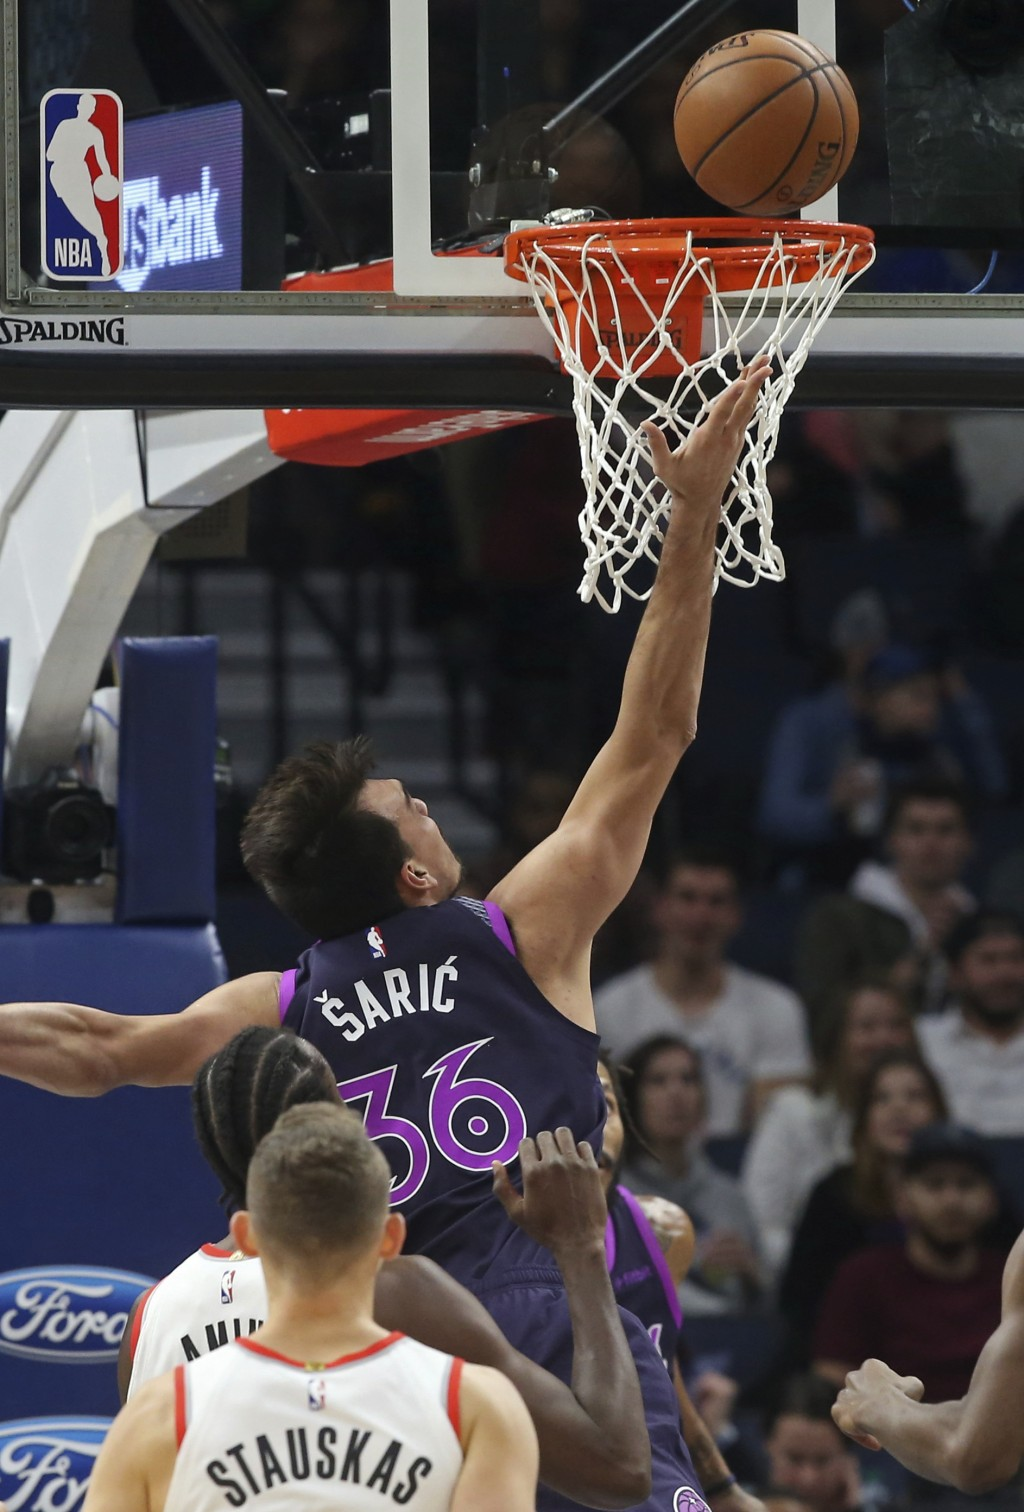 Minnesota Timberwolves' Dario Saric lays up a shot as Portland Trail Blazers' Nik Stauskas, lower left, watches during the first half of an NBA basket...